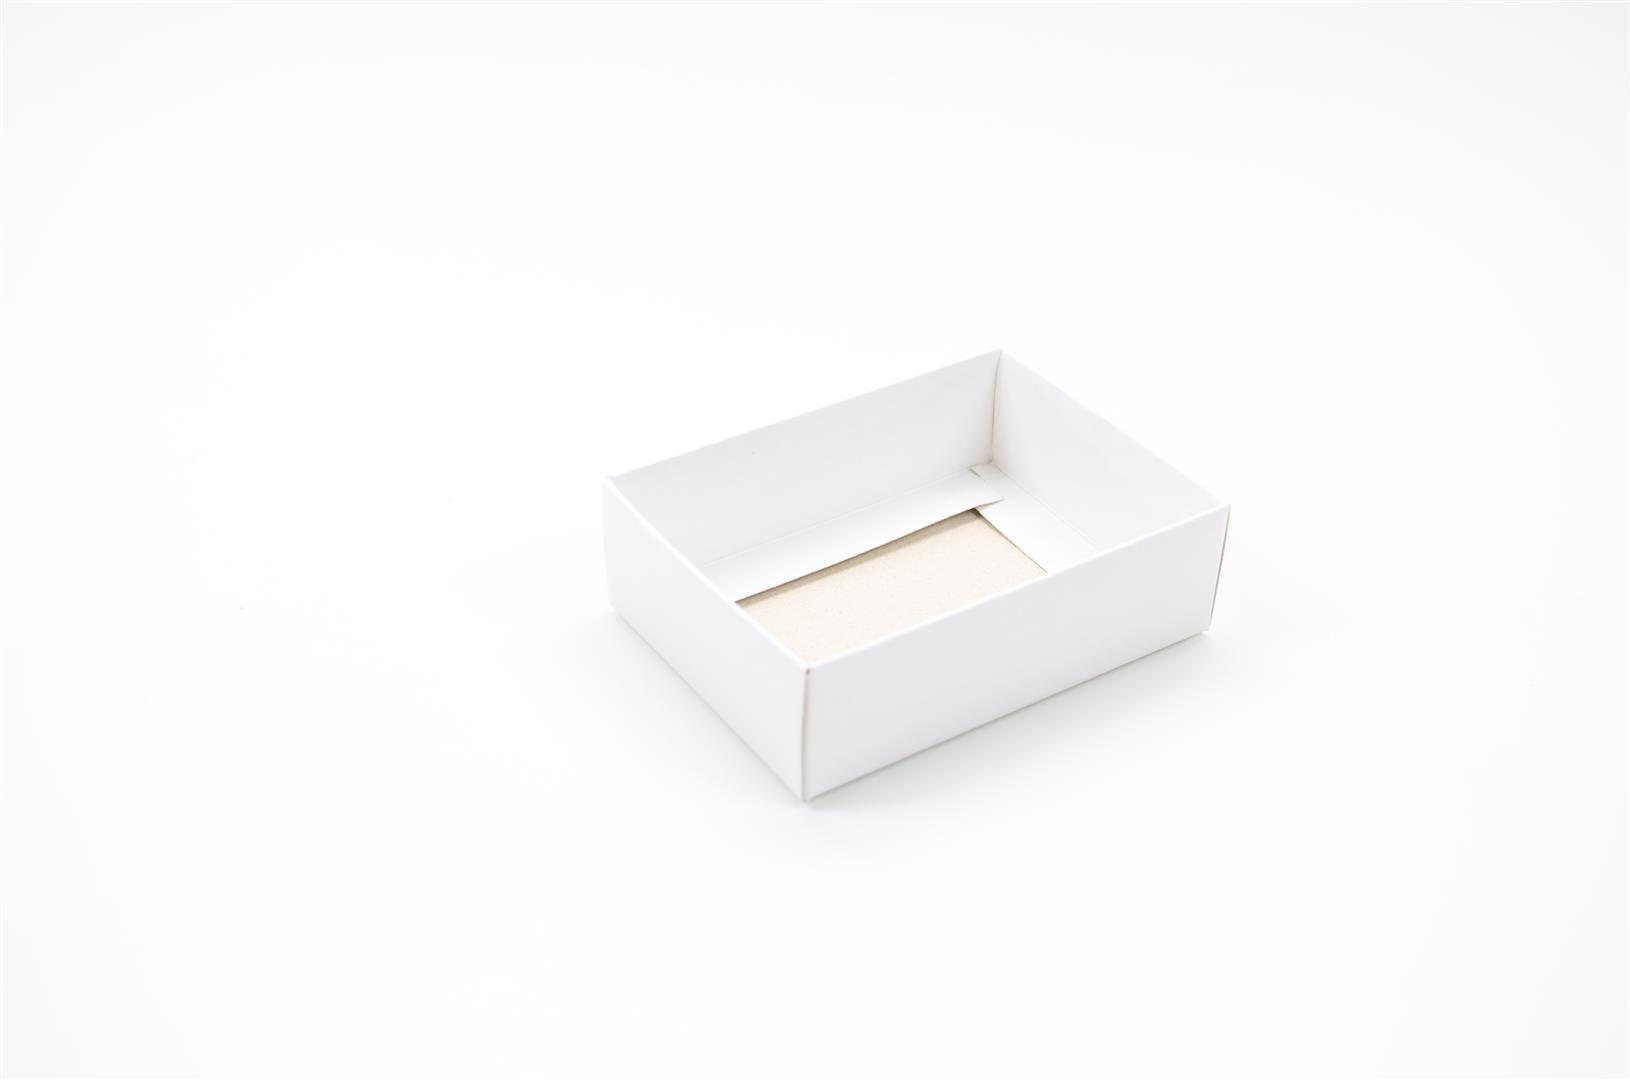 F040 - Fundo - 9,5x7x3 cm